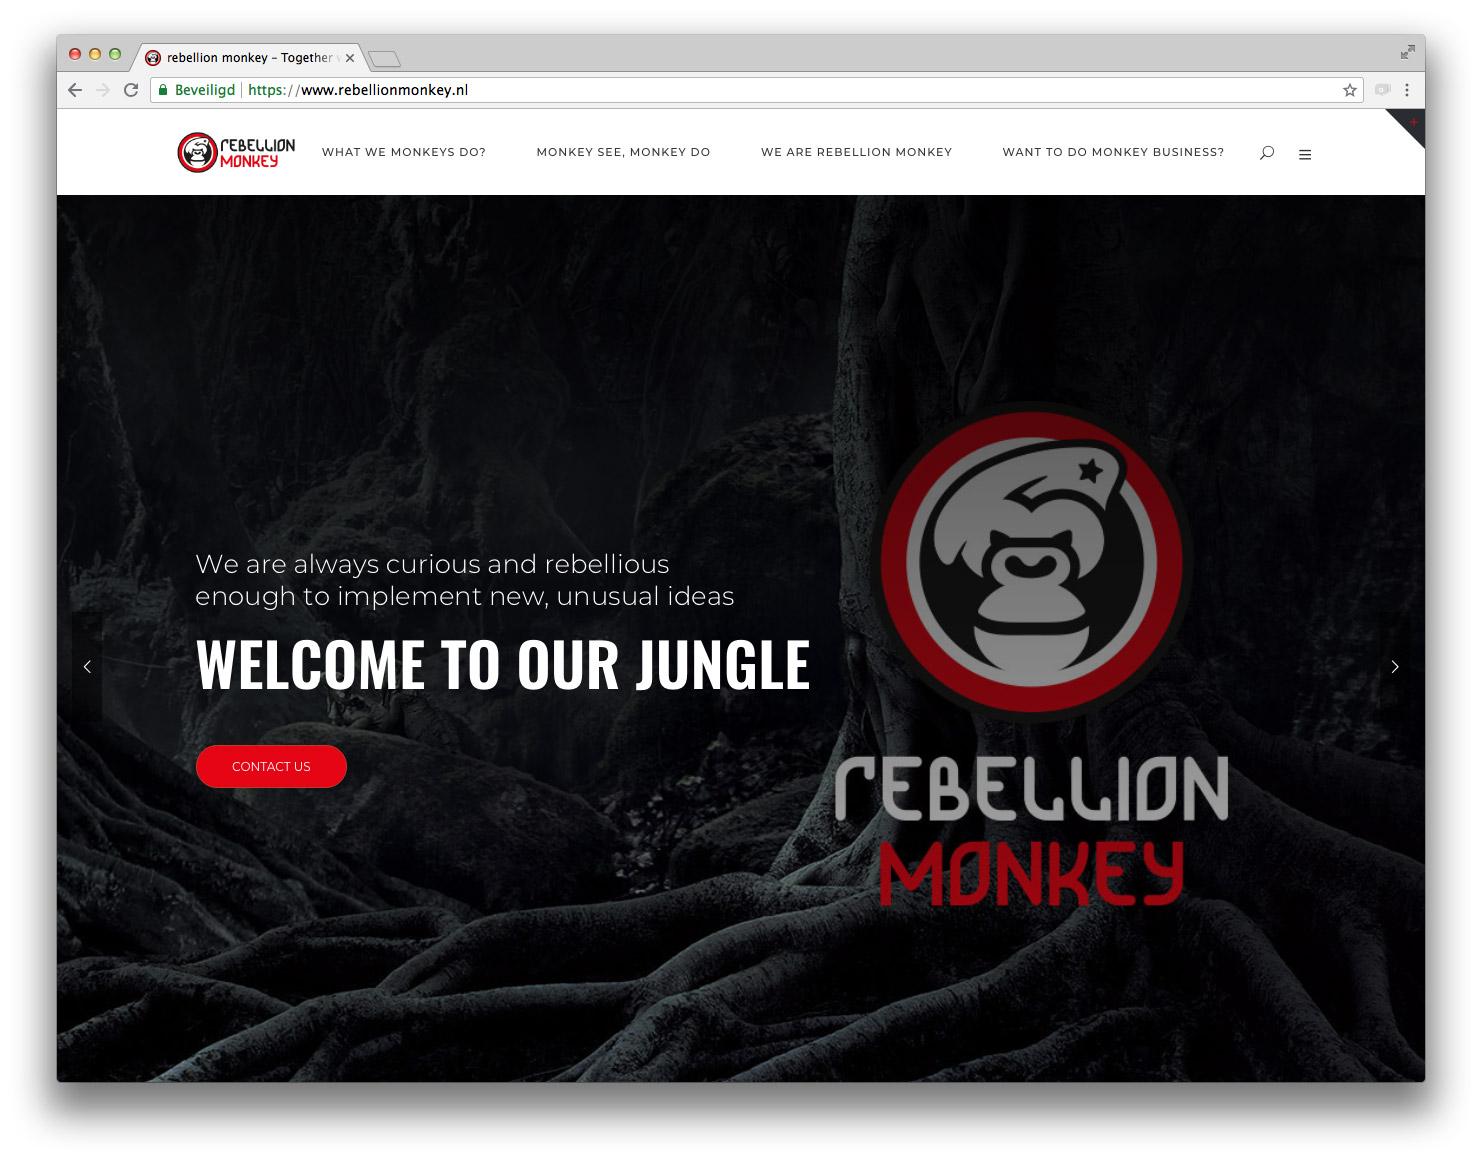 gramid_rebellion_monkey_website